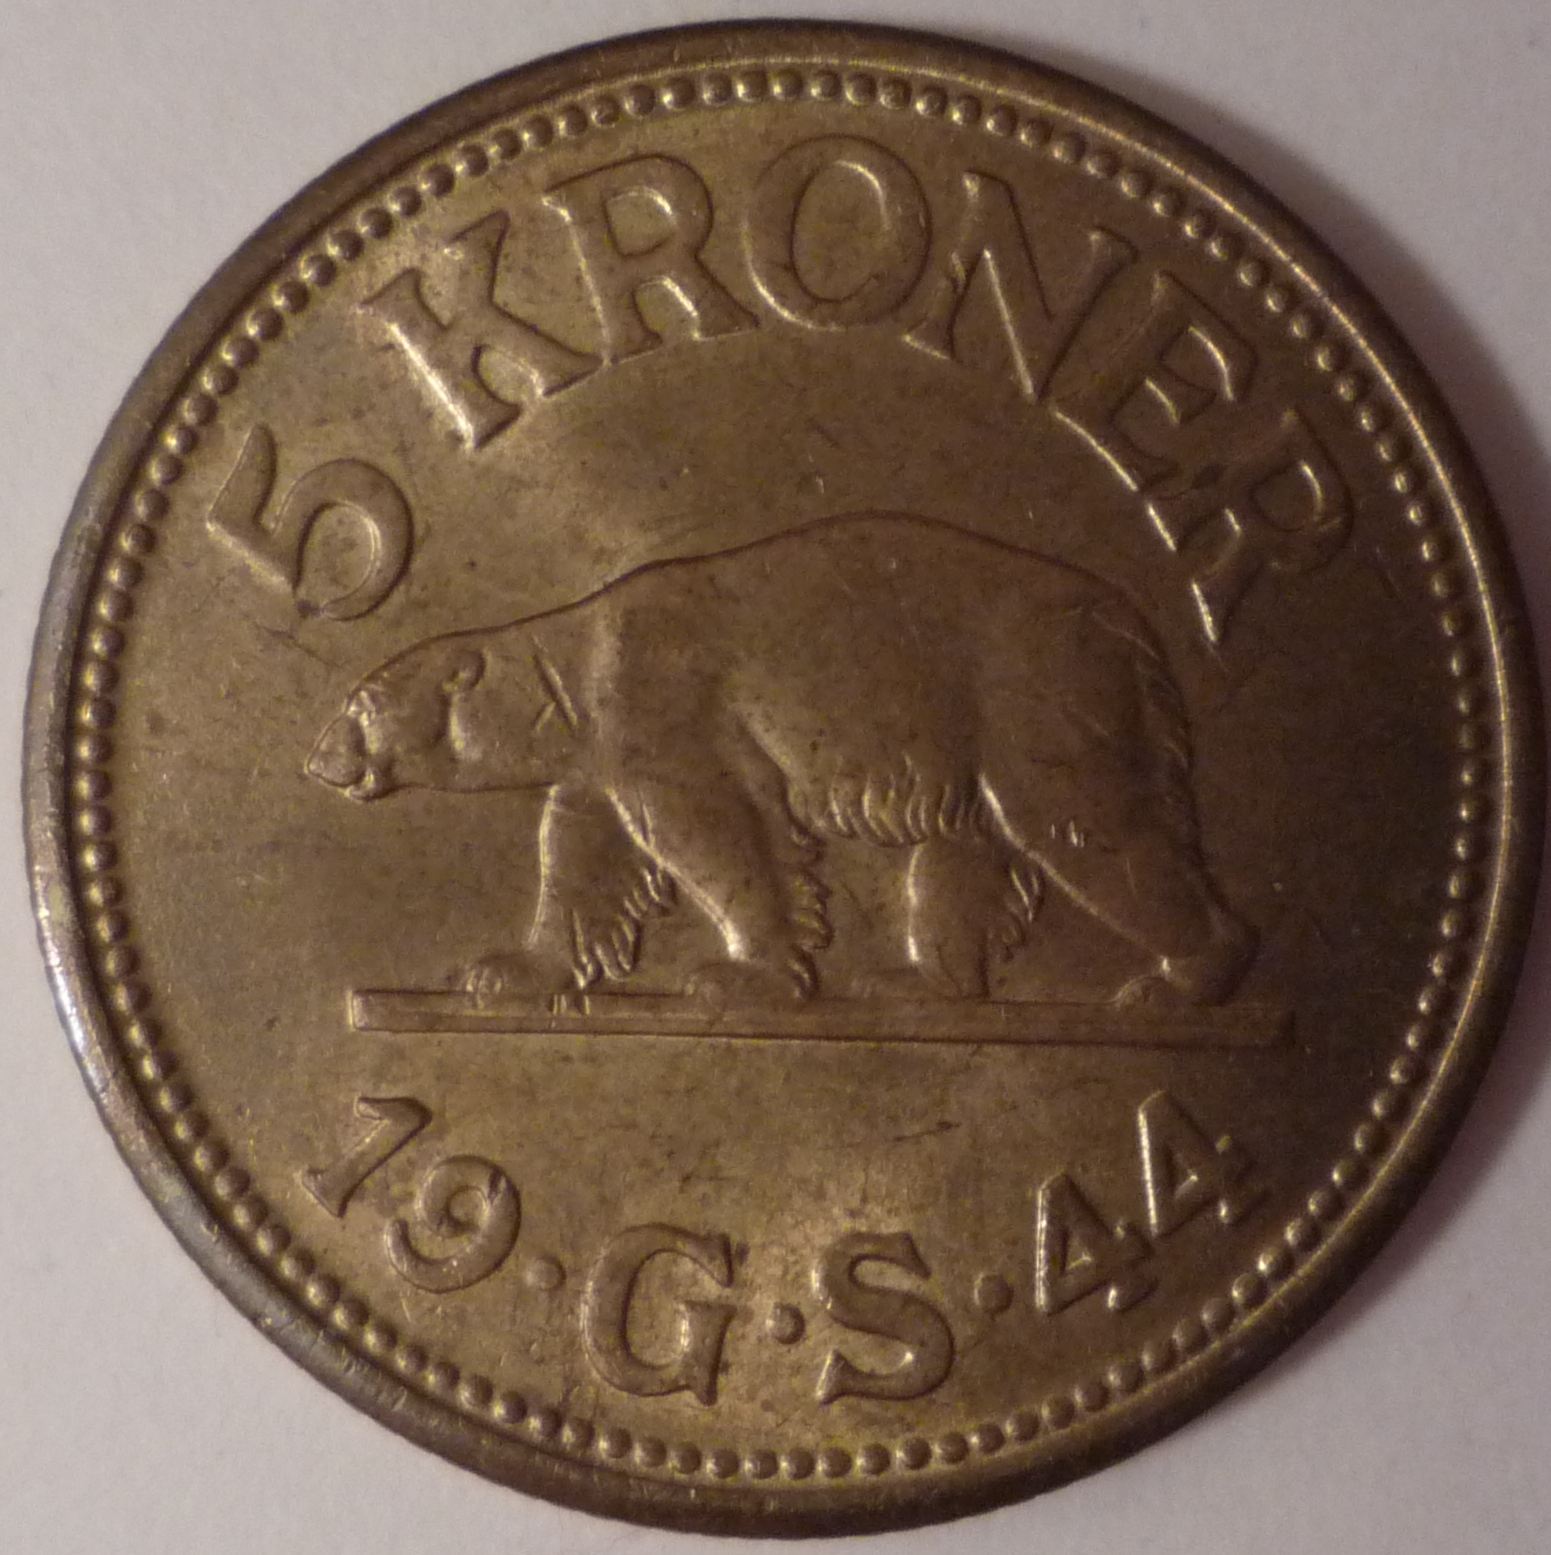 5 Kroner Grønland 001.JPG